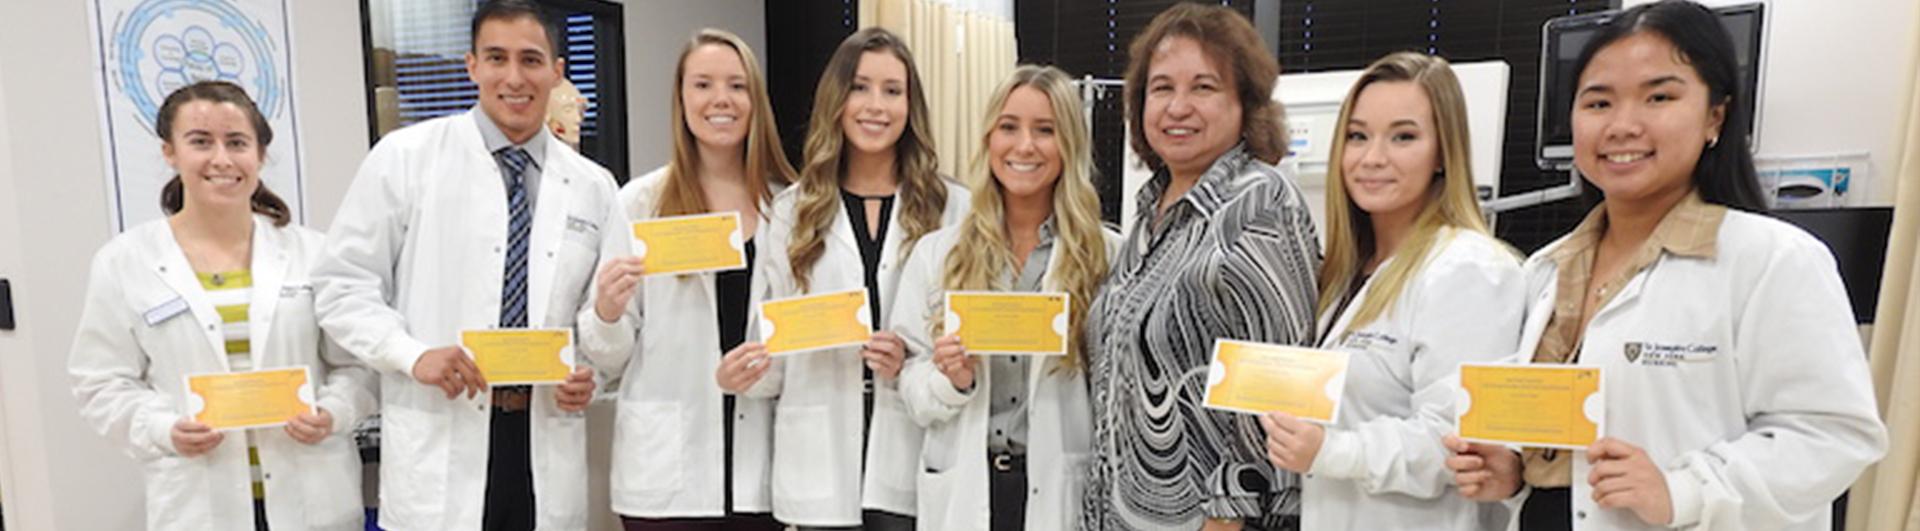 SJC Long Island students holding their golden ticket to Northwell Health's prestigious event.